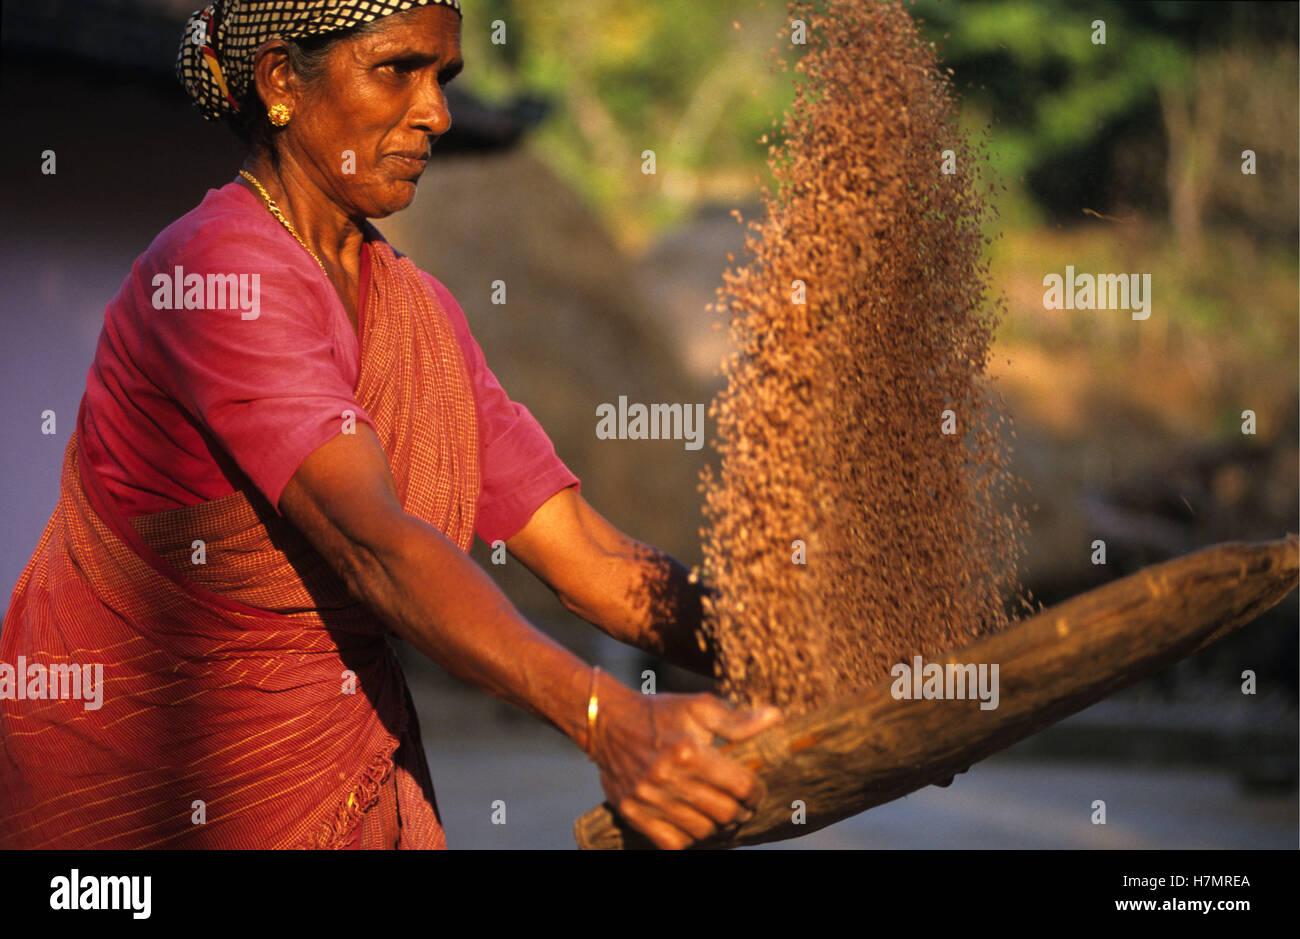 INDIA Karnataka, Moodbidri, rice farming, woman winnowing rice to separate grain from chaff - Stock Image